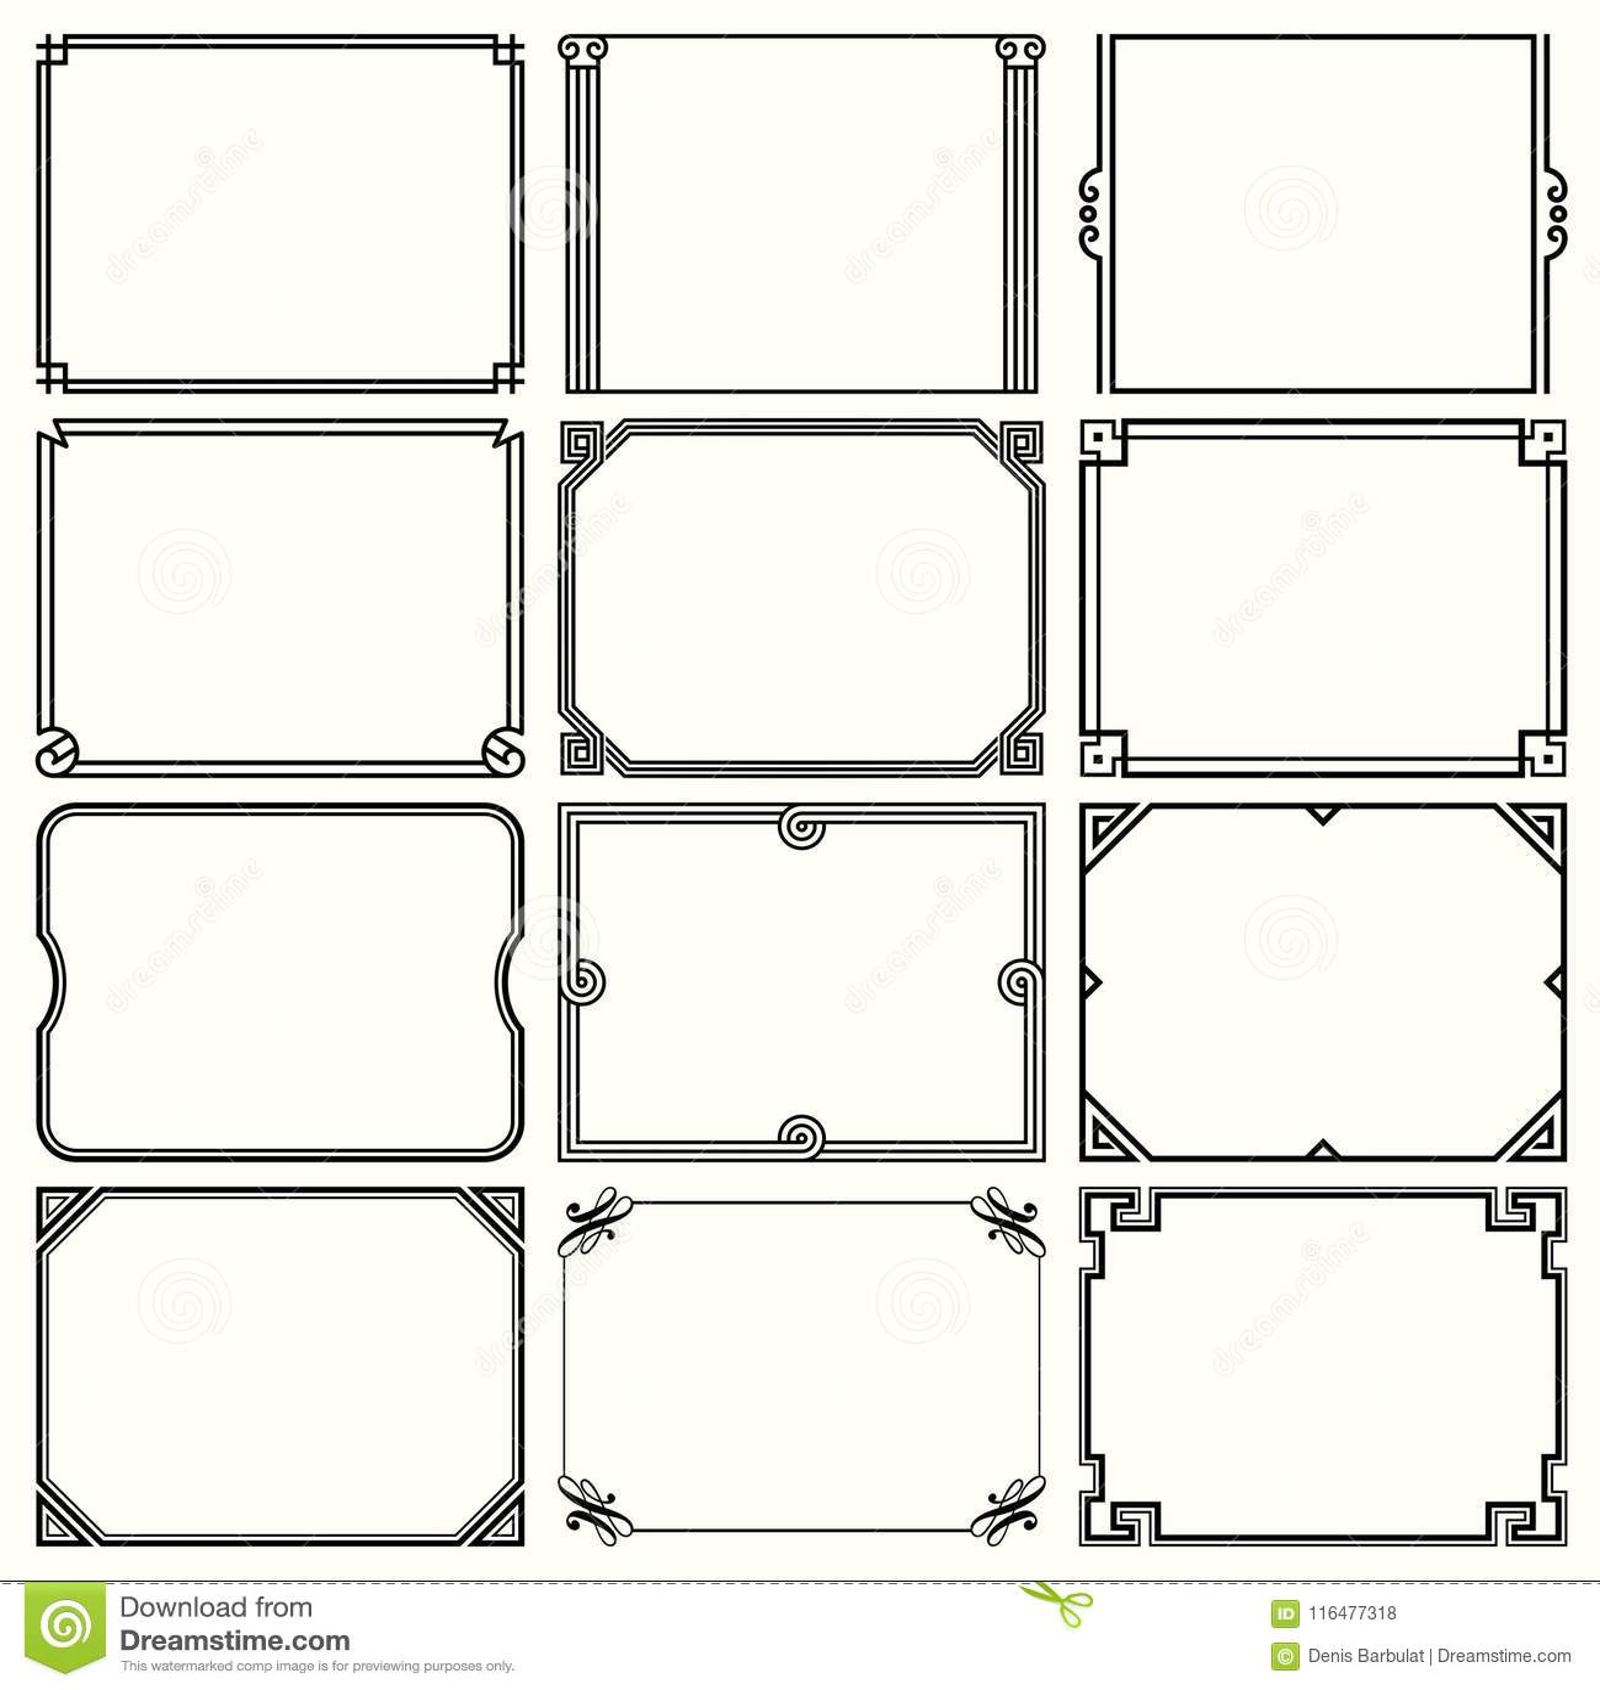 Decorative Simple Frames Set 8 Stock Vector - Illustration of ornate ...